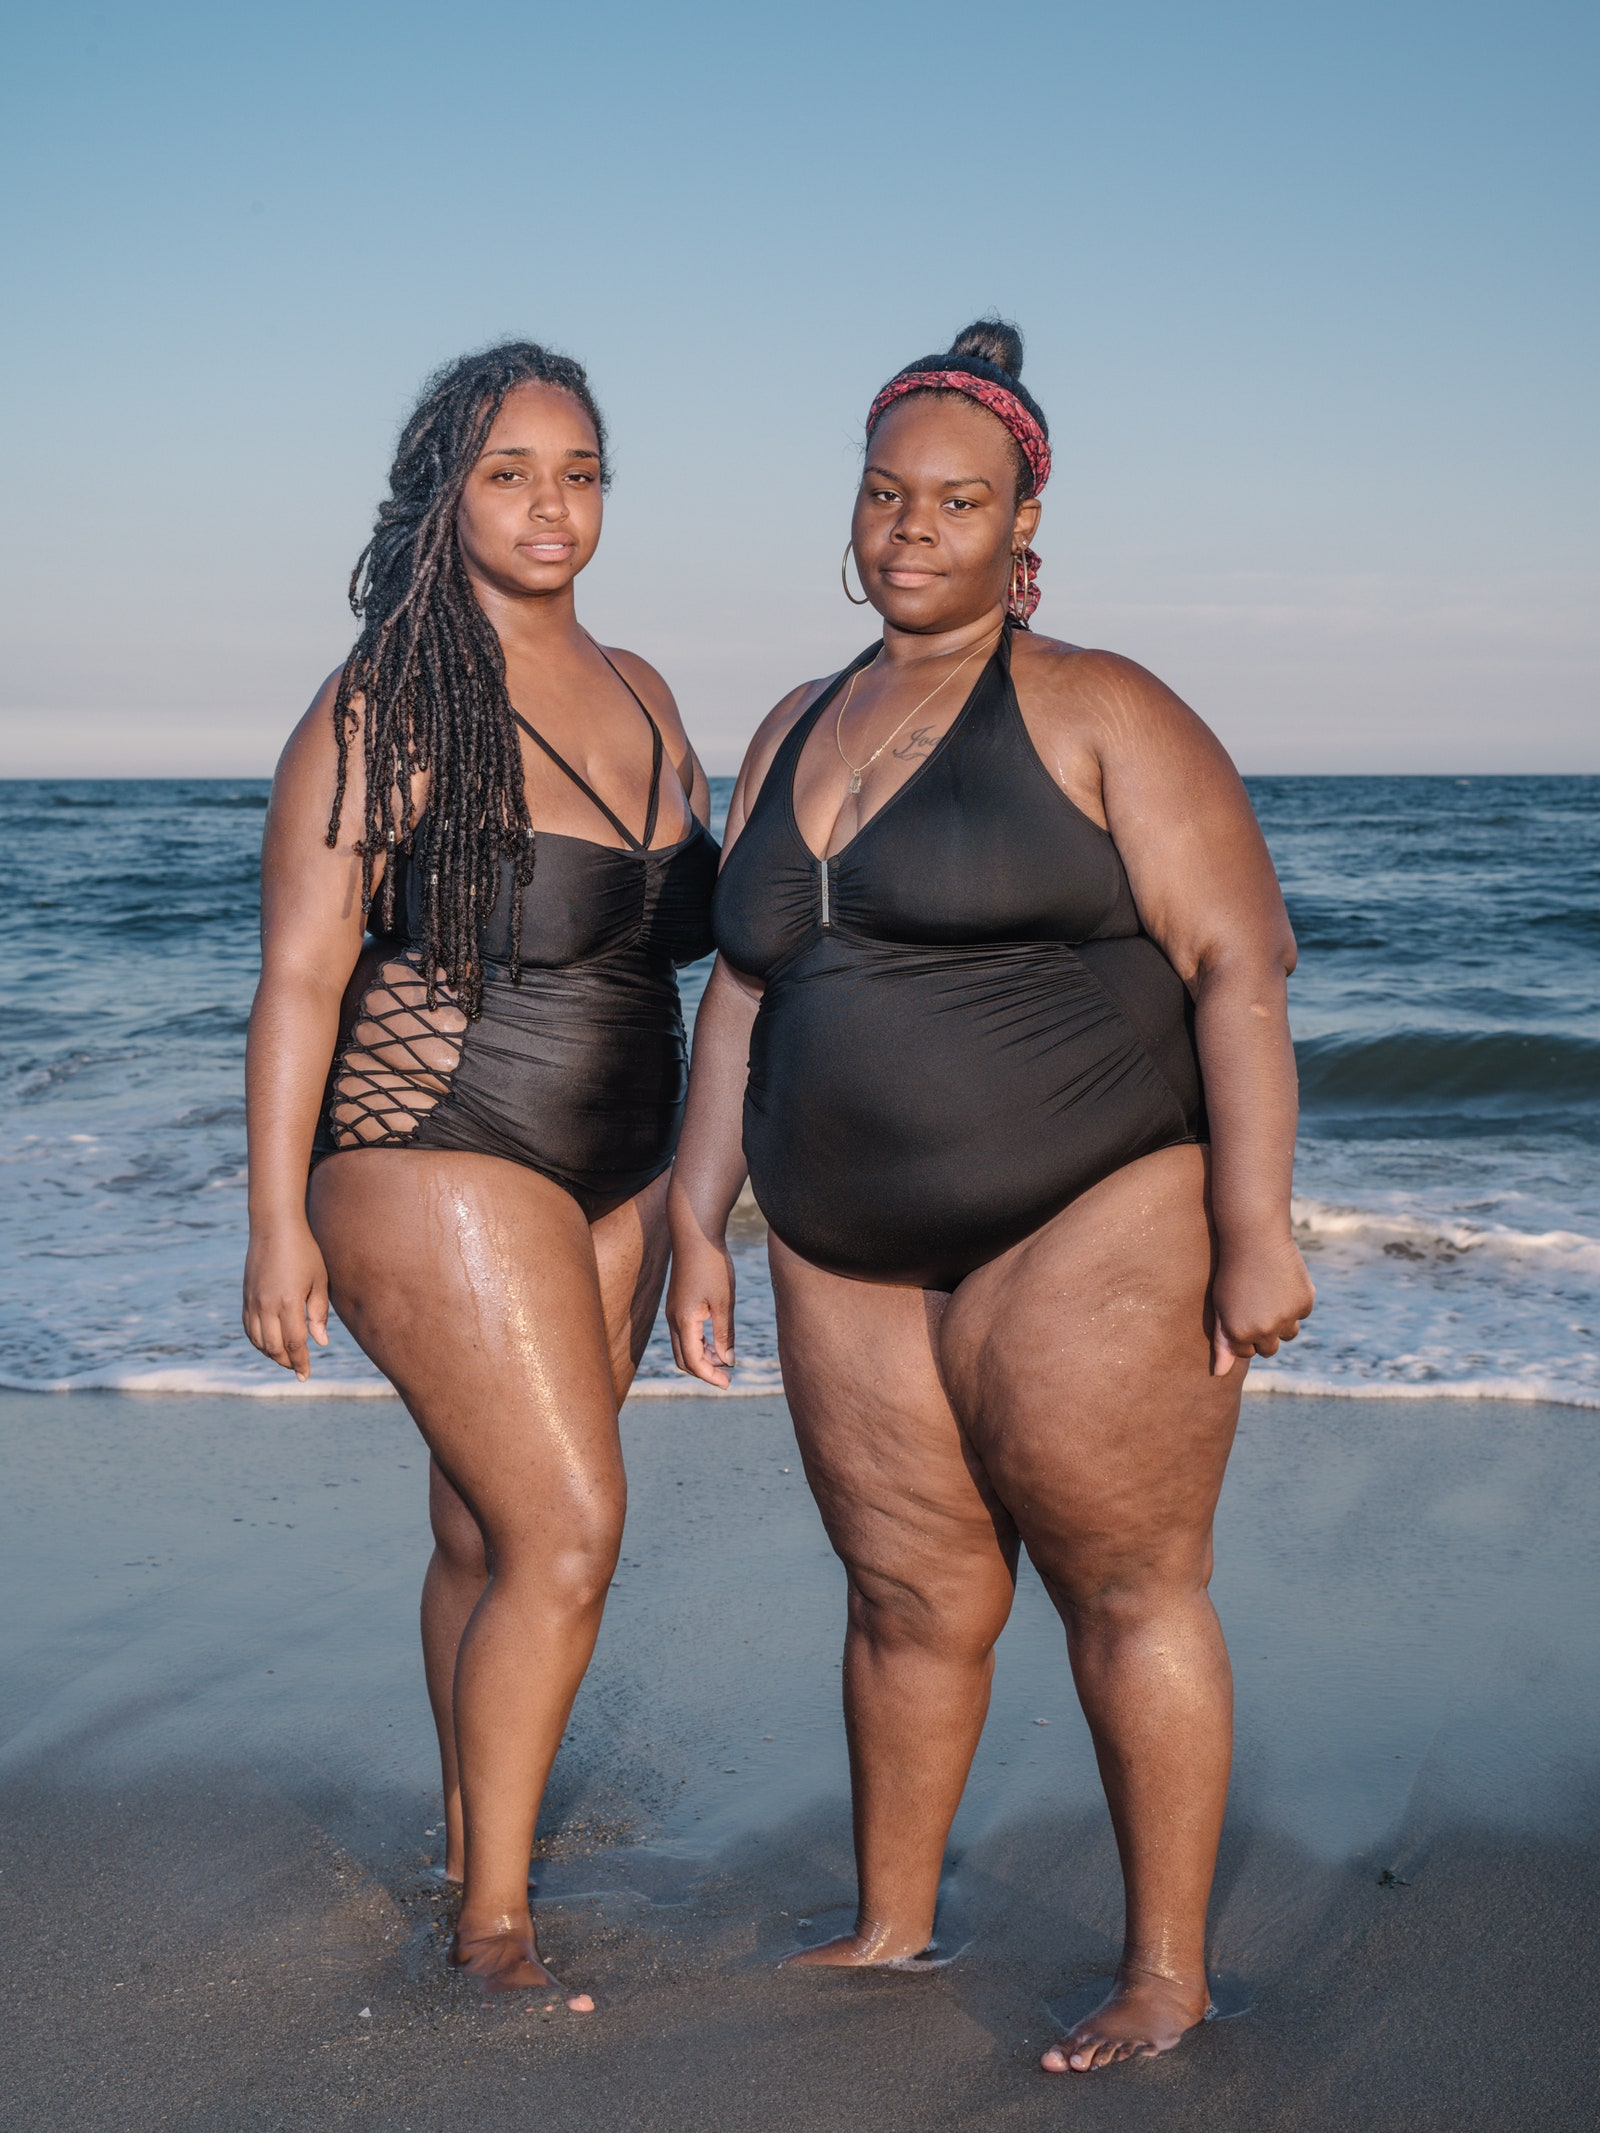 Three naked girls on the beach